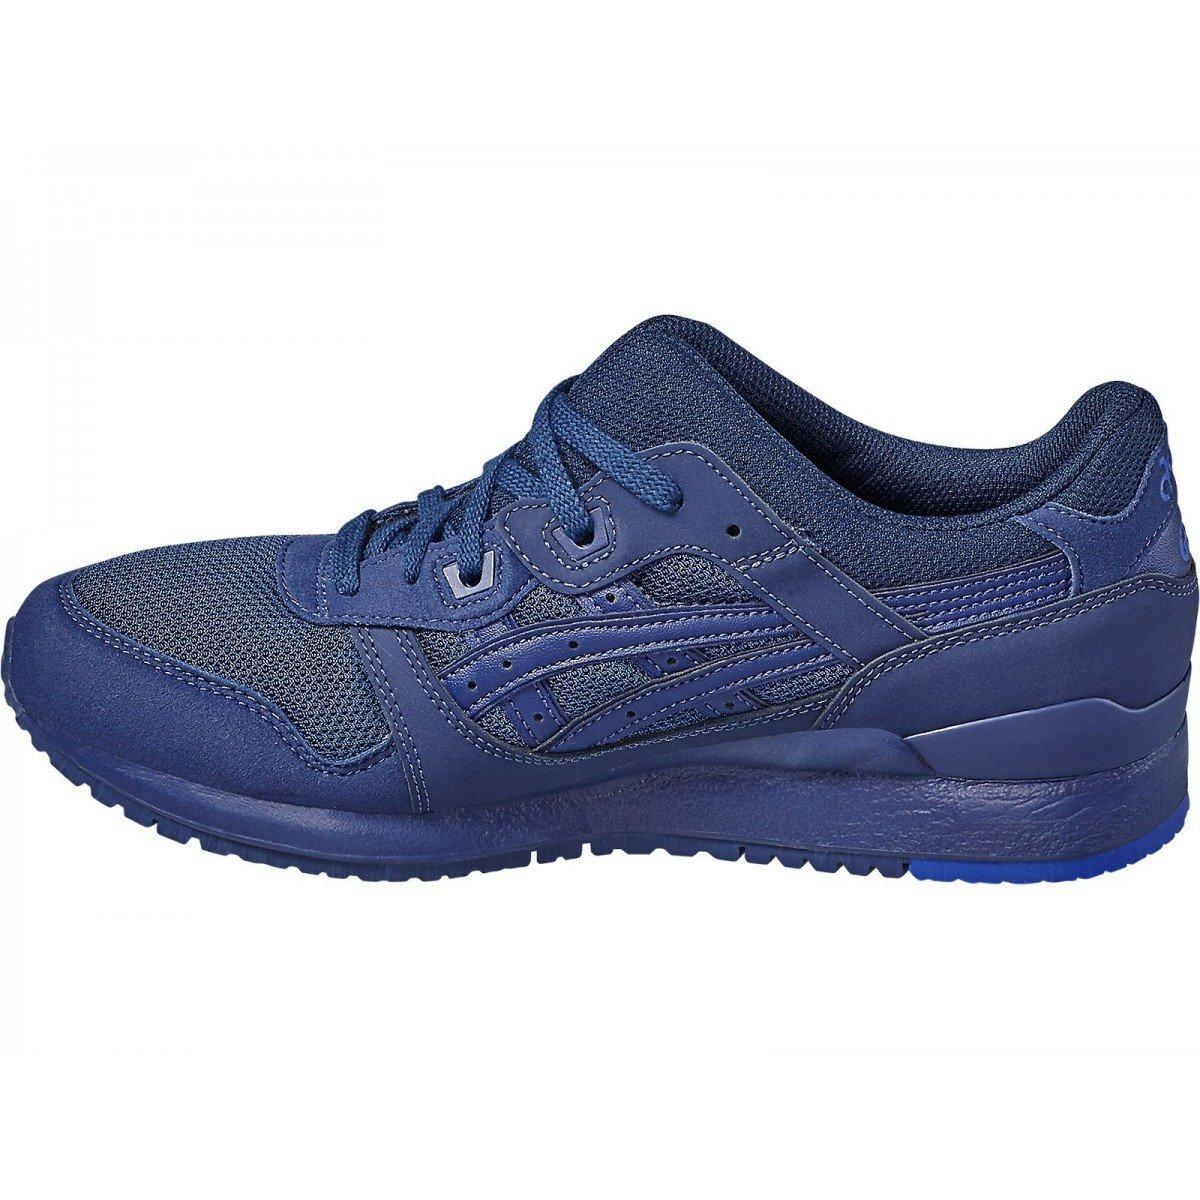 the latest 72a1a a8ea1 Asics - Gel Lyte III Indigo/Blue - Sneakers Men - 8.5 UK